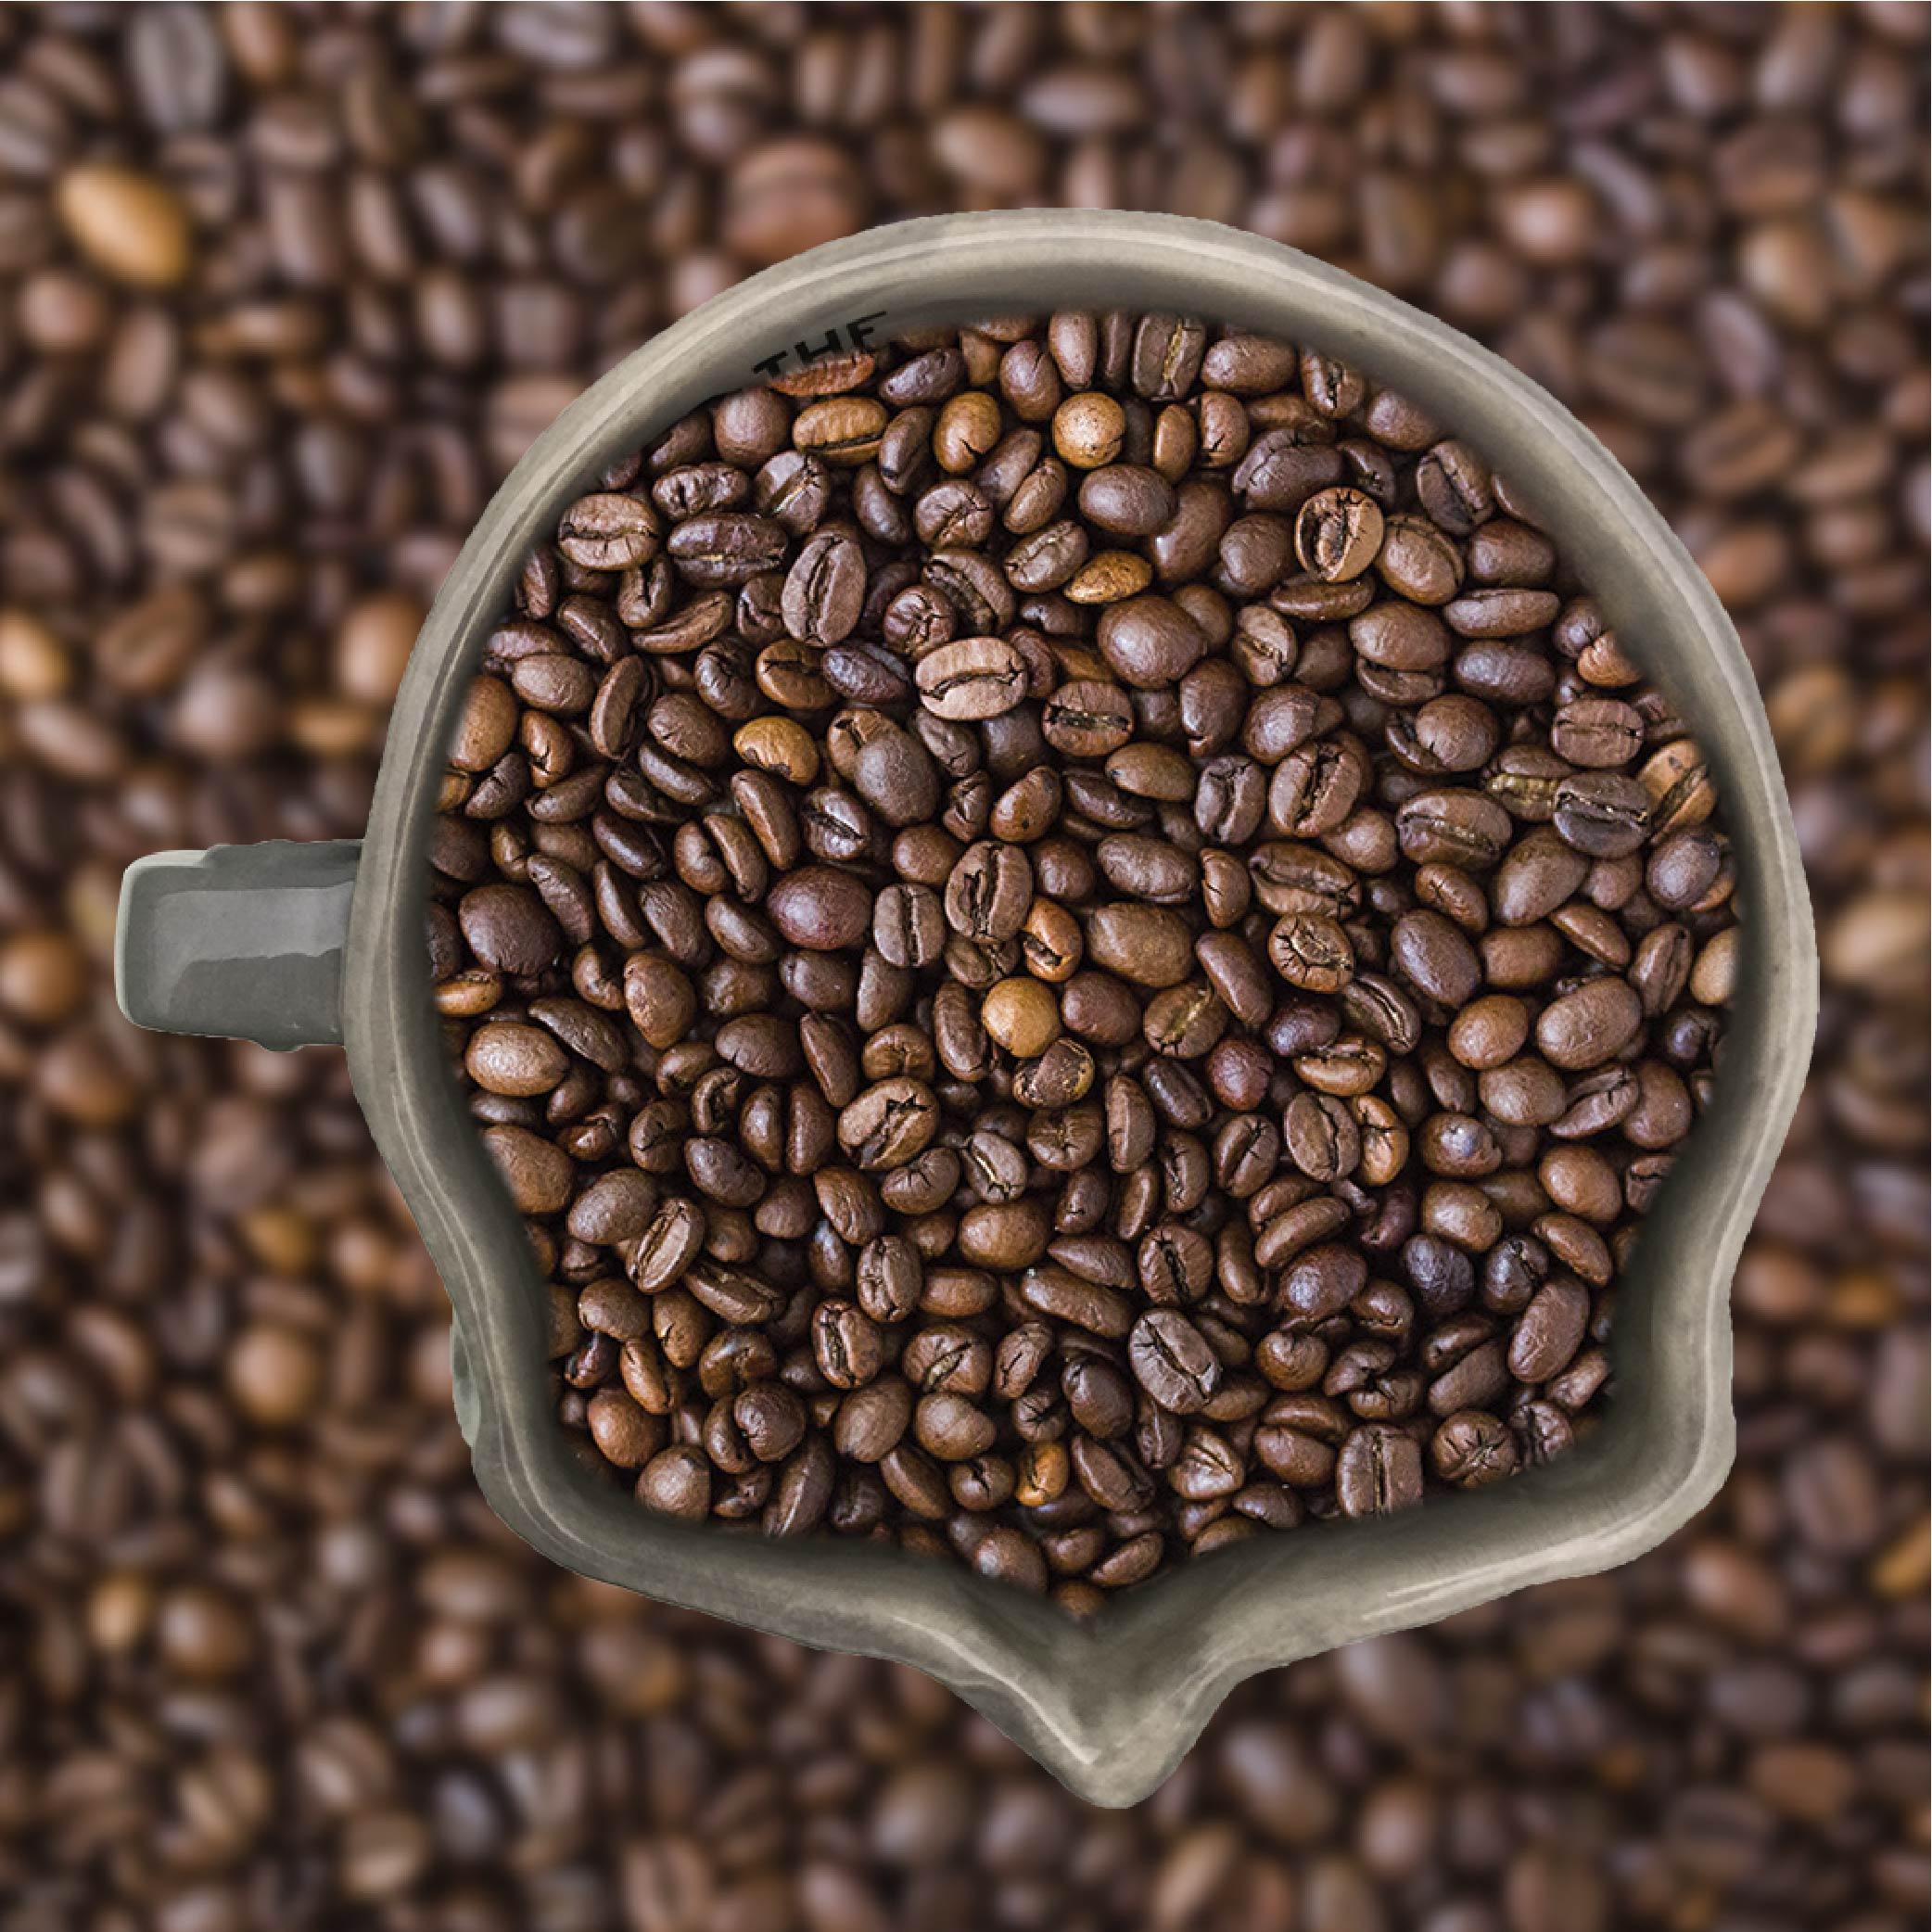 Marvel Comics 17 ounce Coffee Mug, The Punisher slideshow image 6